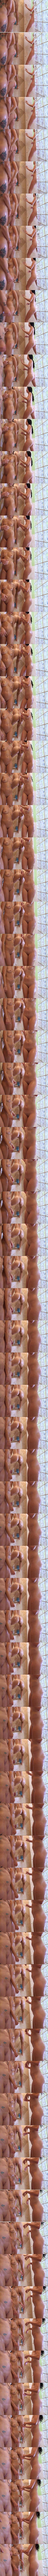 amateur model nude page